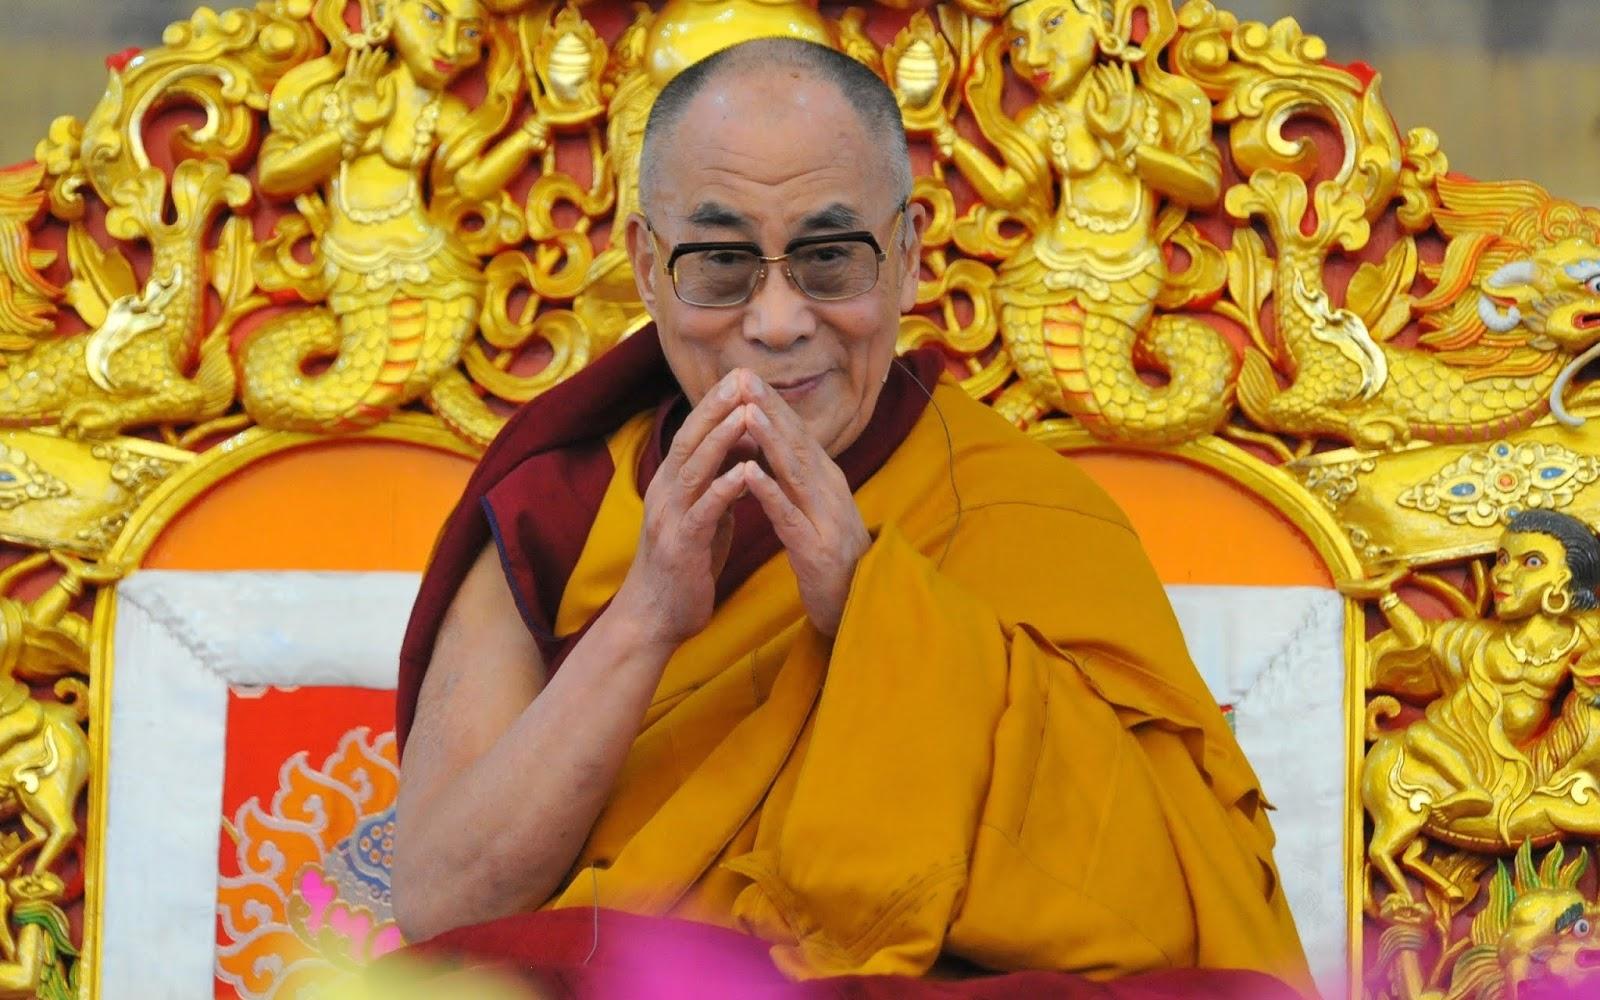 Religion, Tibetan Buddhism, Buddhism, Dalai Lama, Tenzin wallpapers image